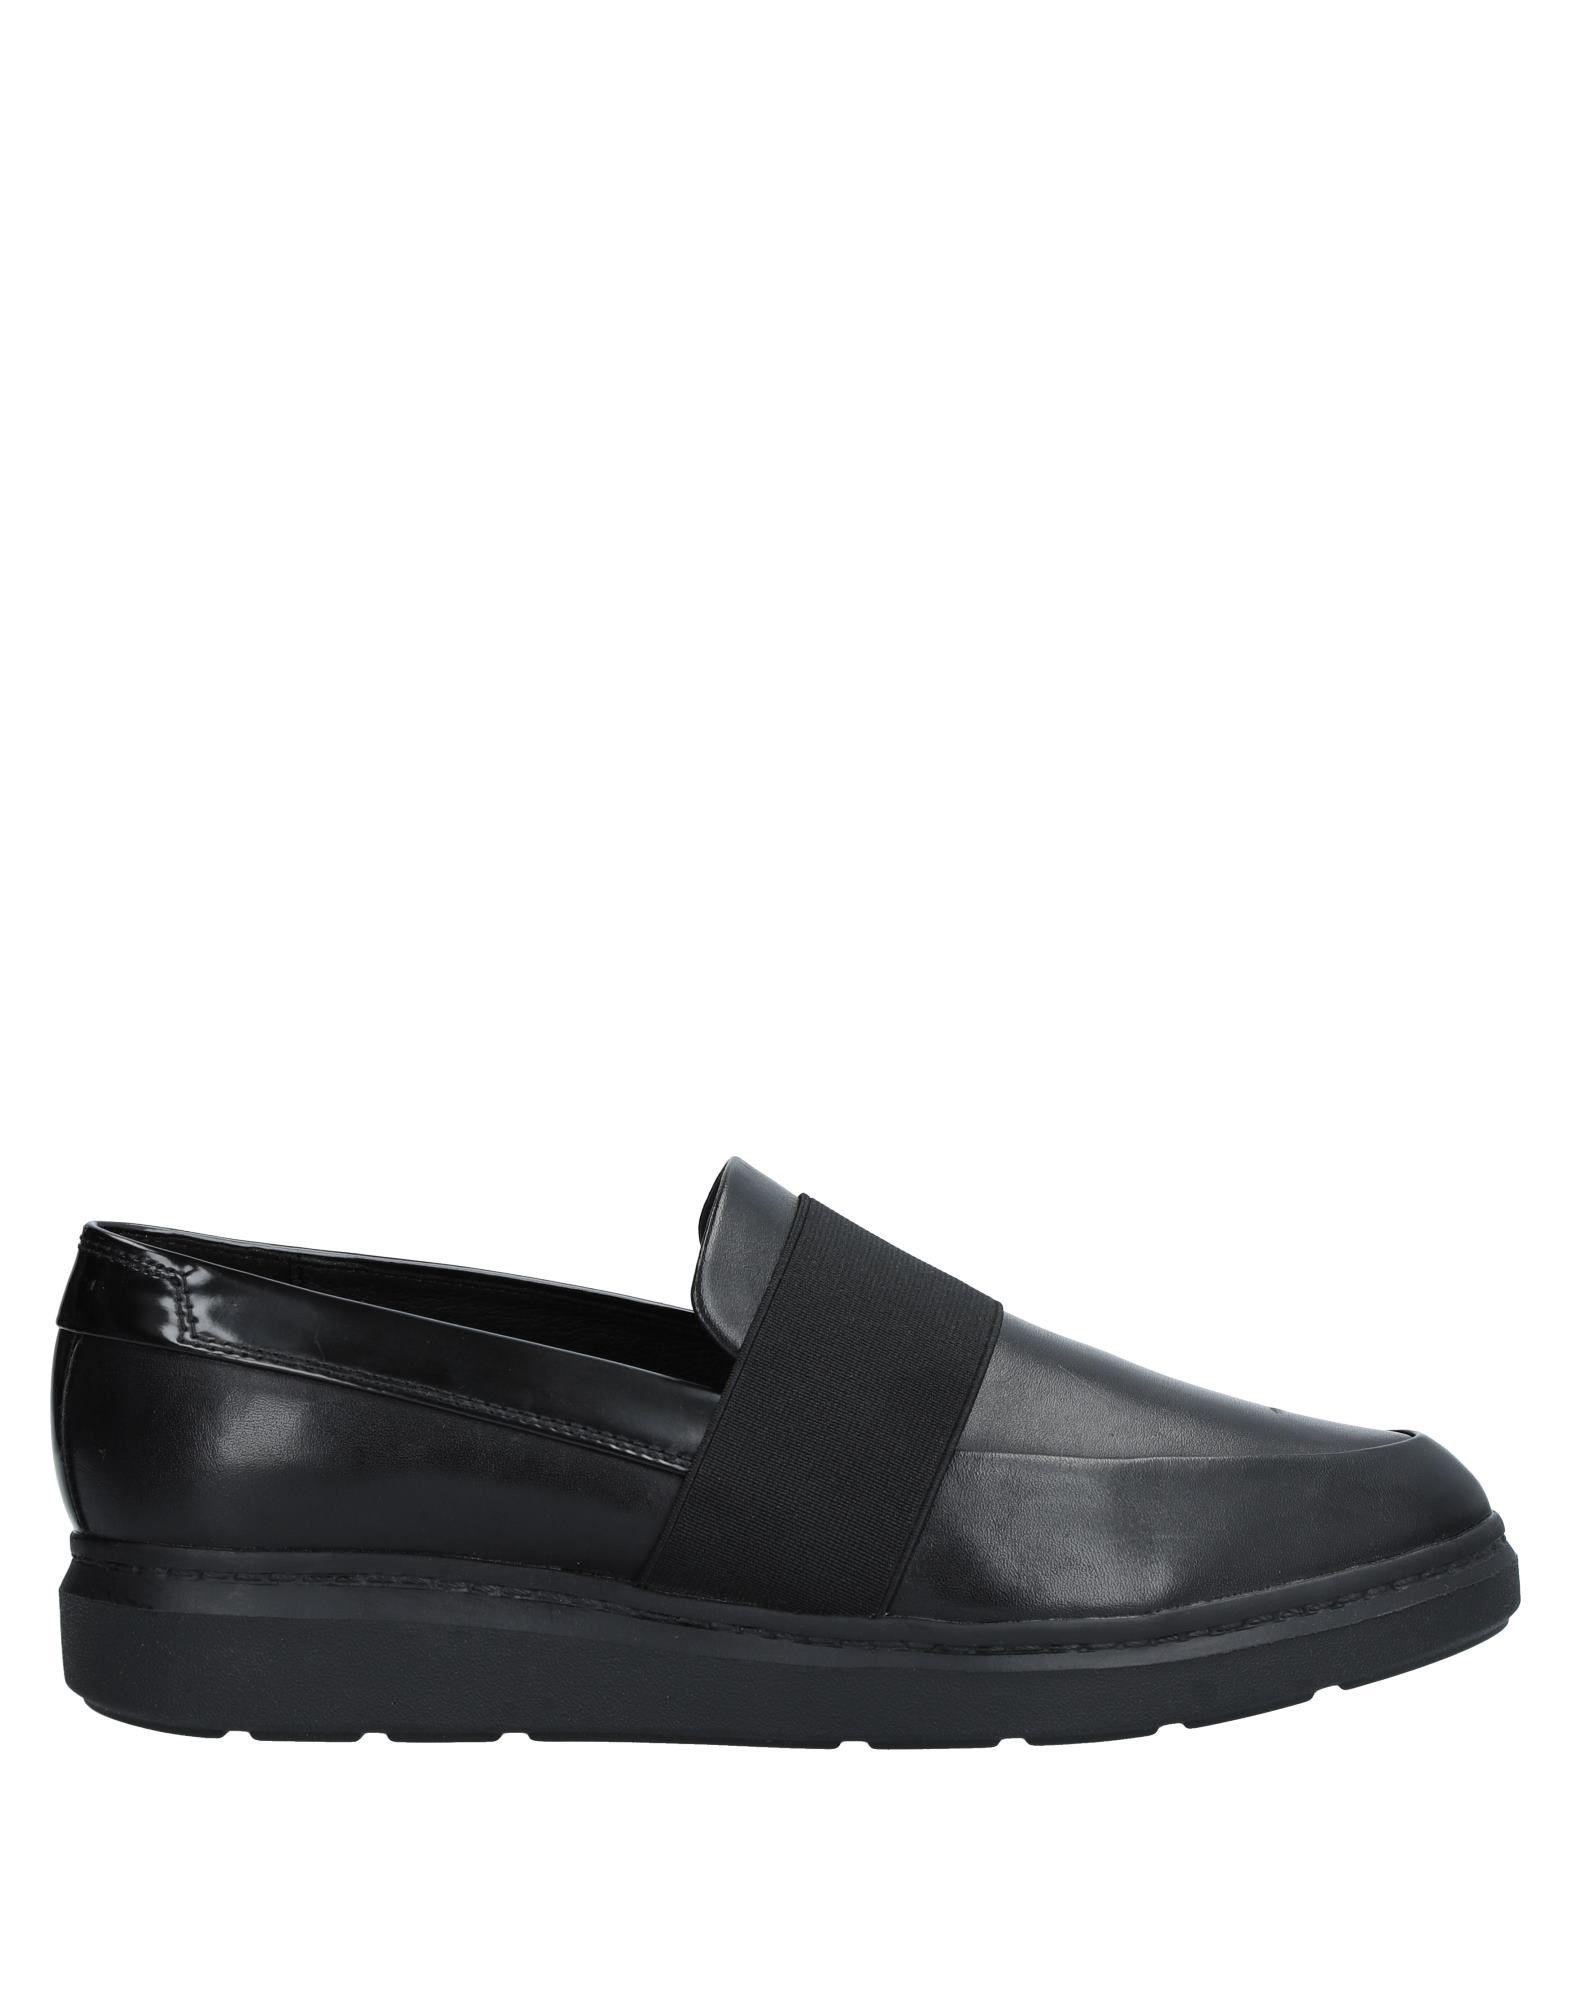 Haltbare Mode billige Schuhe Geox Mokassins Damen  11540553NP Heiße Schuhe